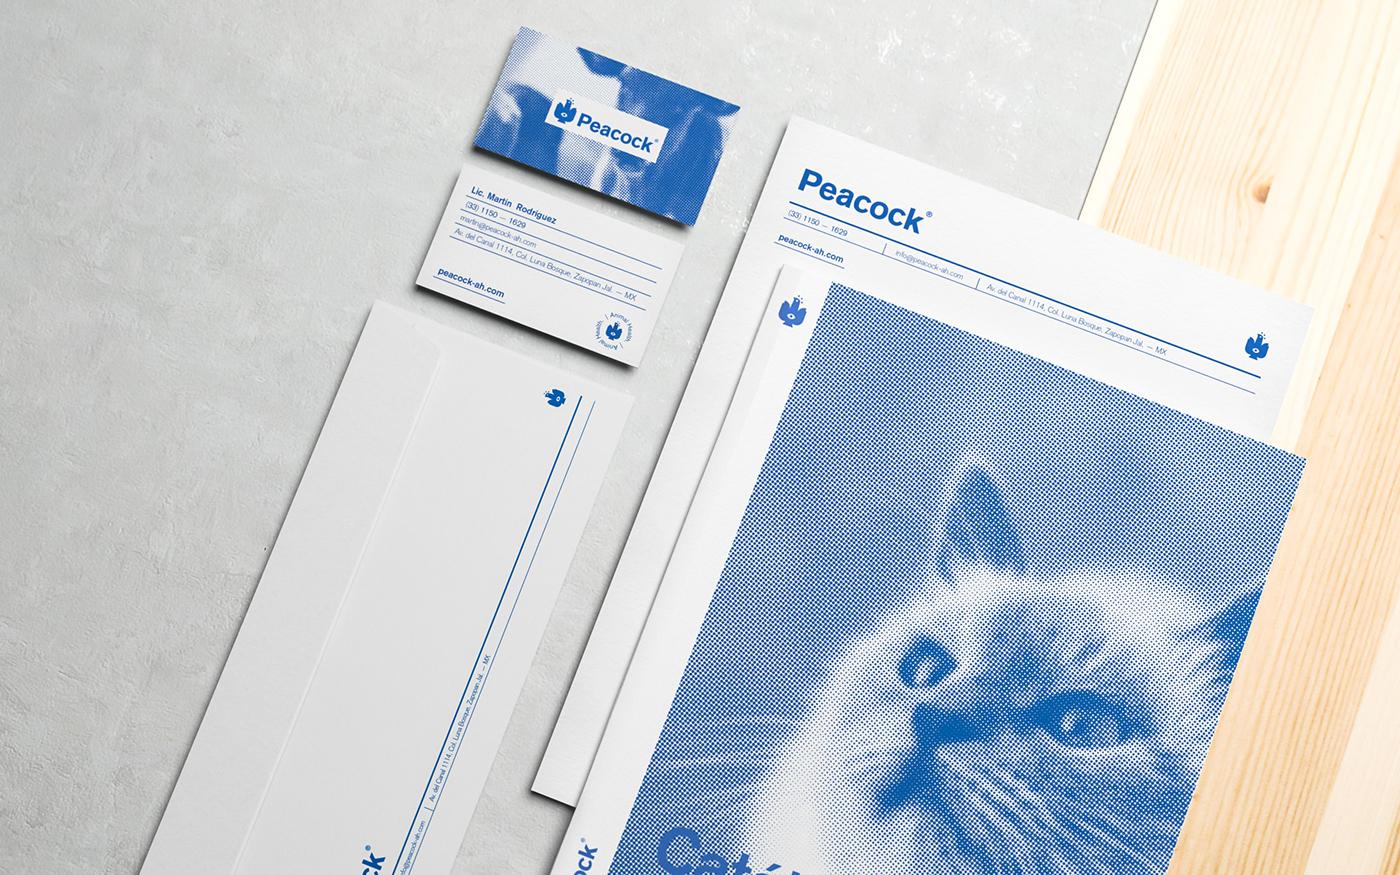 #brand indentity peacock medical vet Packaging logo blue branding  menta picante